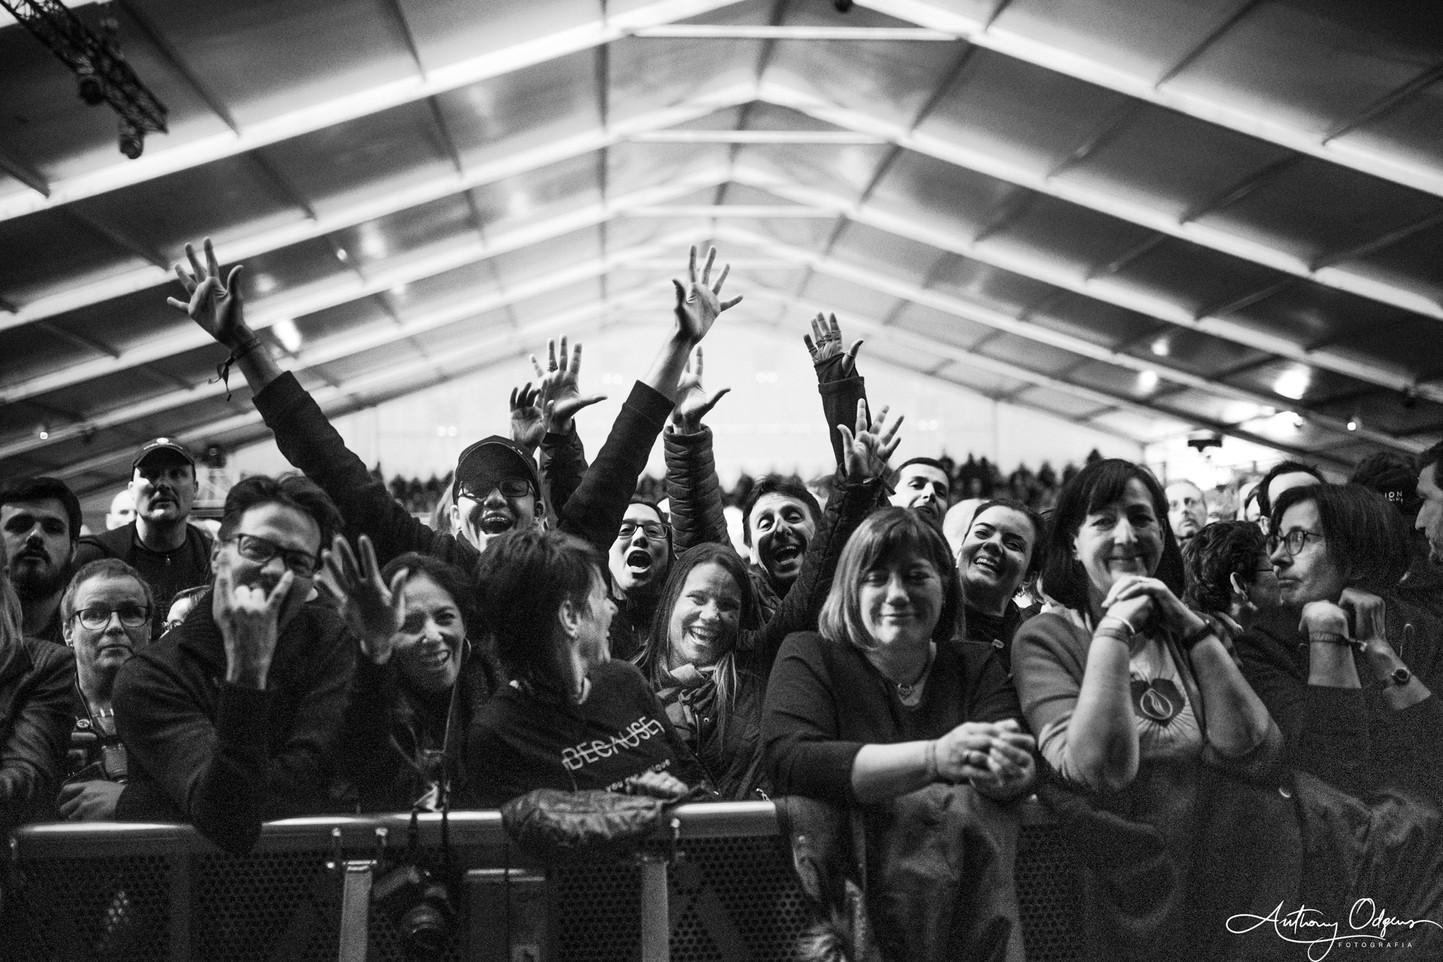 2019-03-24-Marillion Weekend 2019.jpg